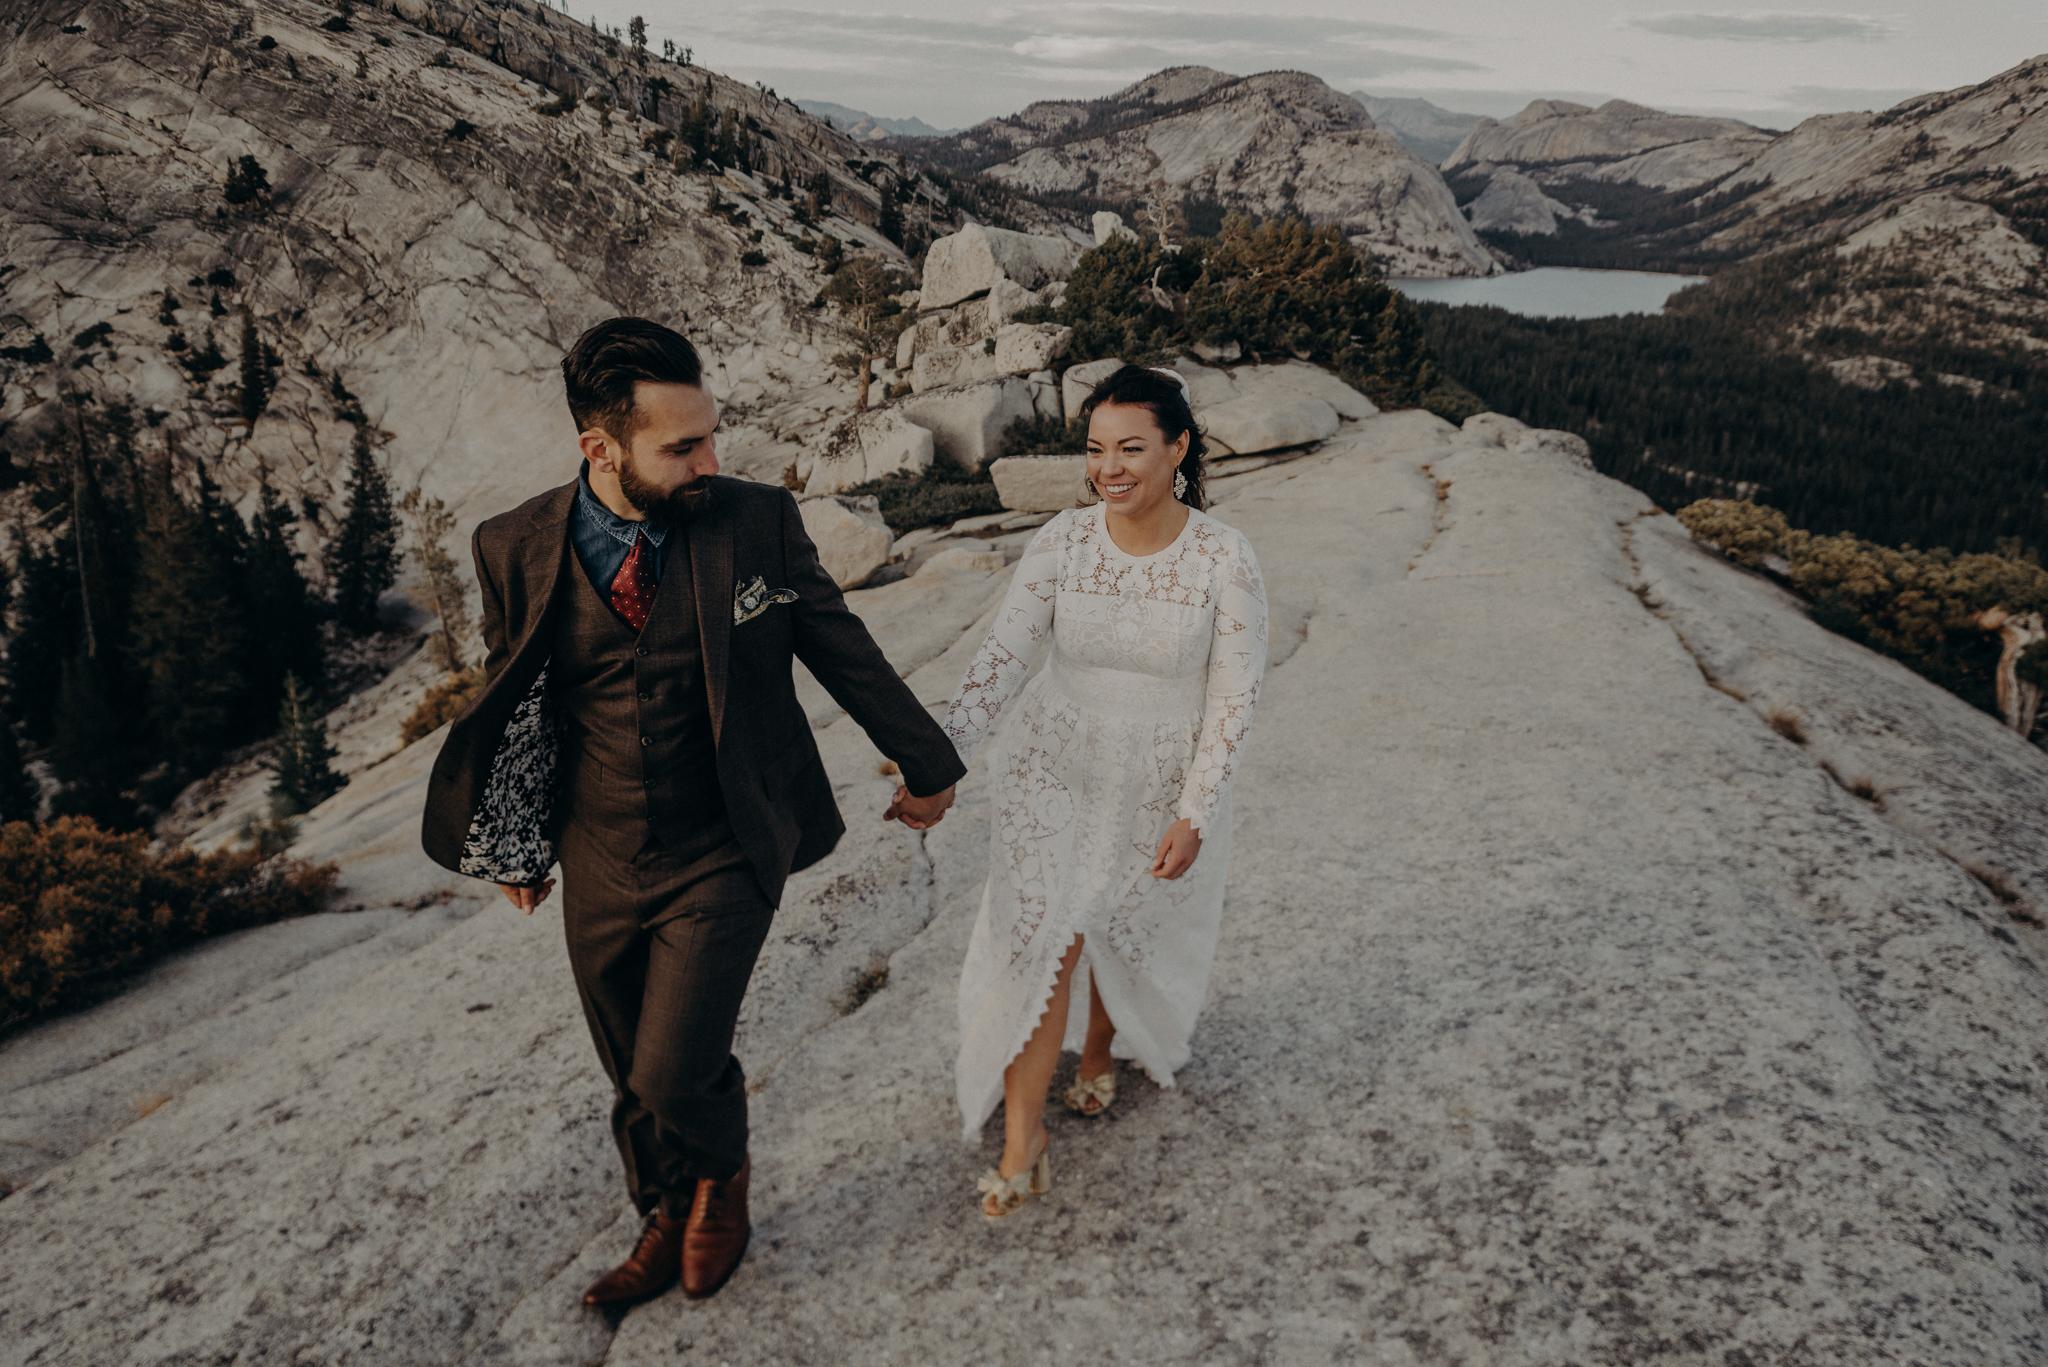 evergreen lodge wedding venue